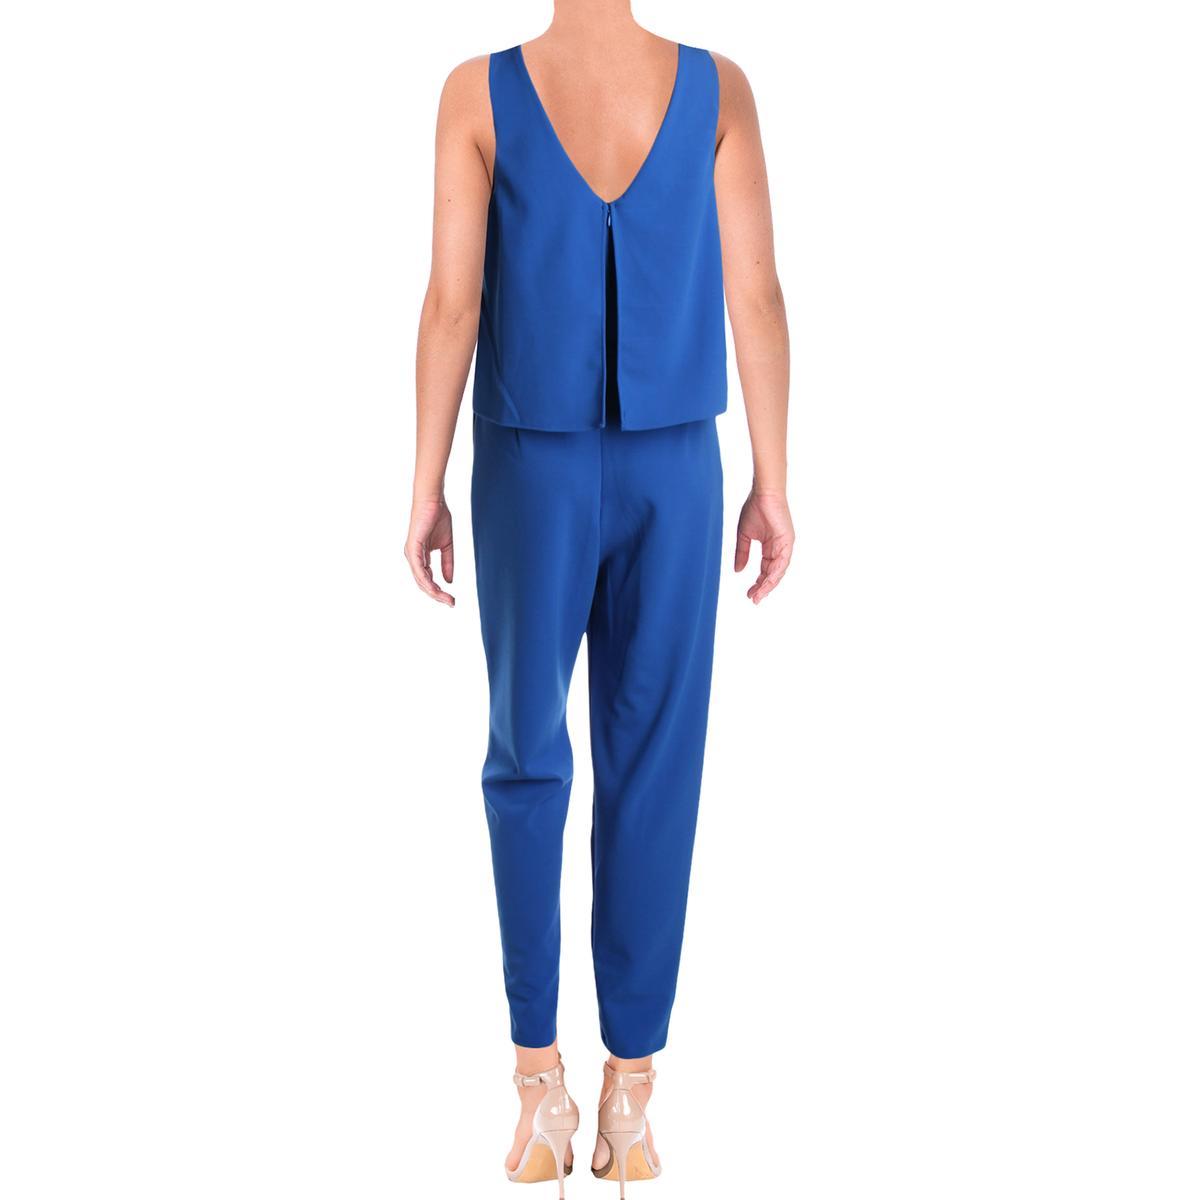 Aqua Womens Cora Popover Straight Leg Dressy Jumpsuit BHFO 7046